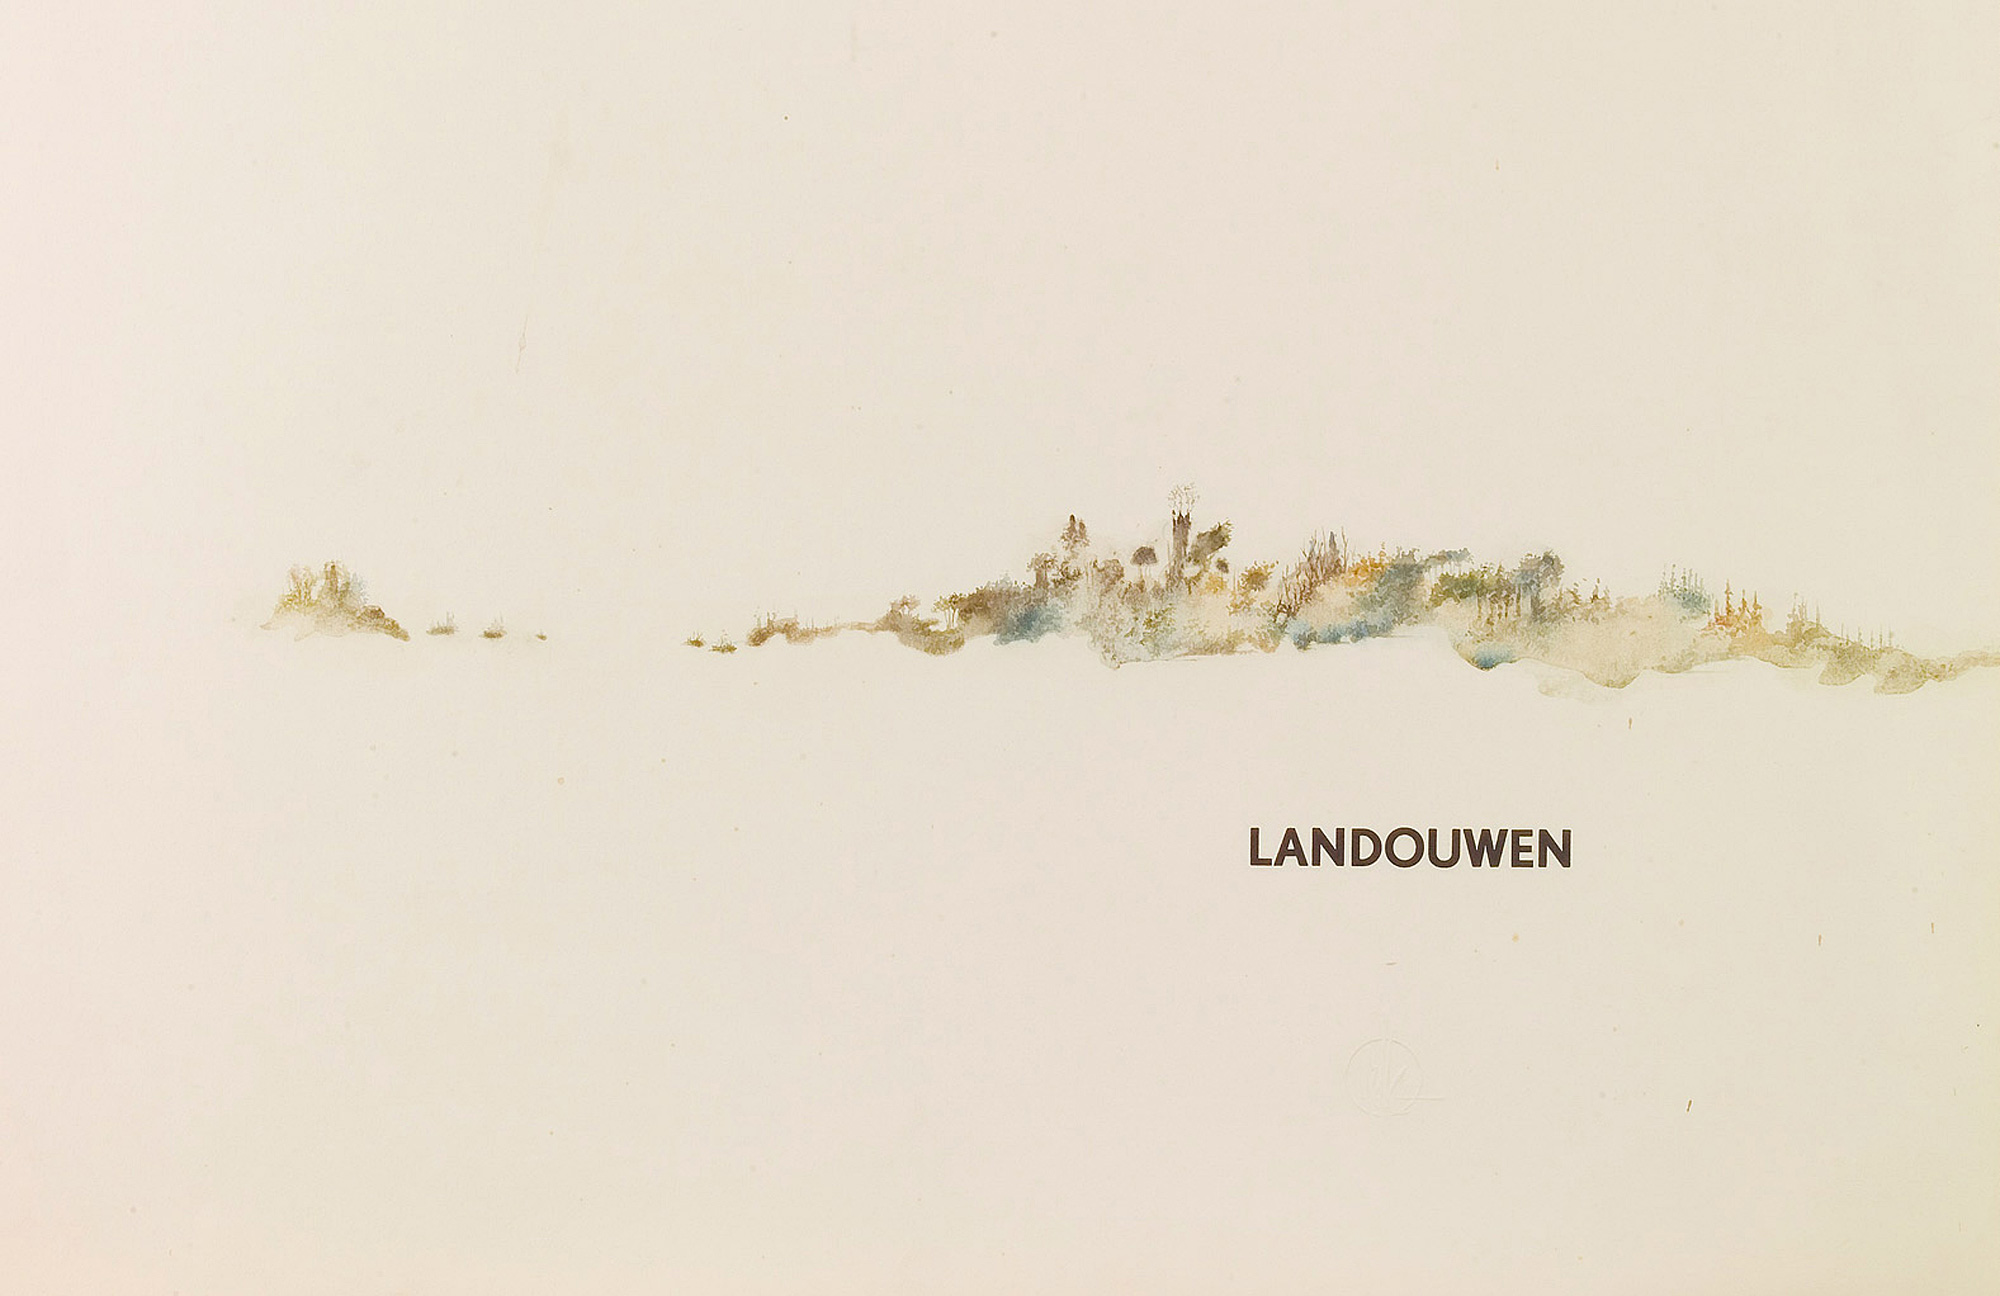 Melle schilder | Landouwen, aquarelverf op papier